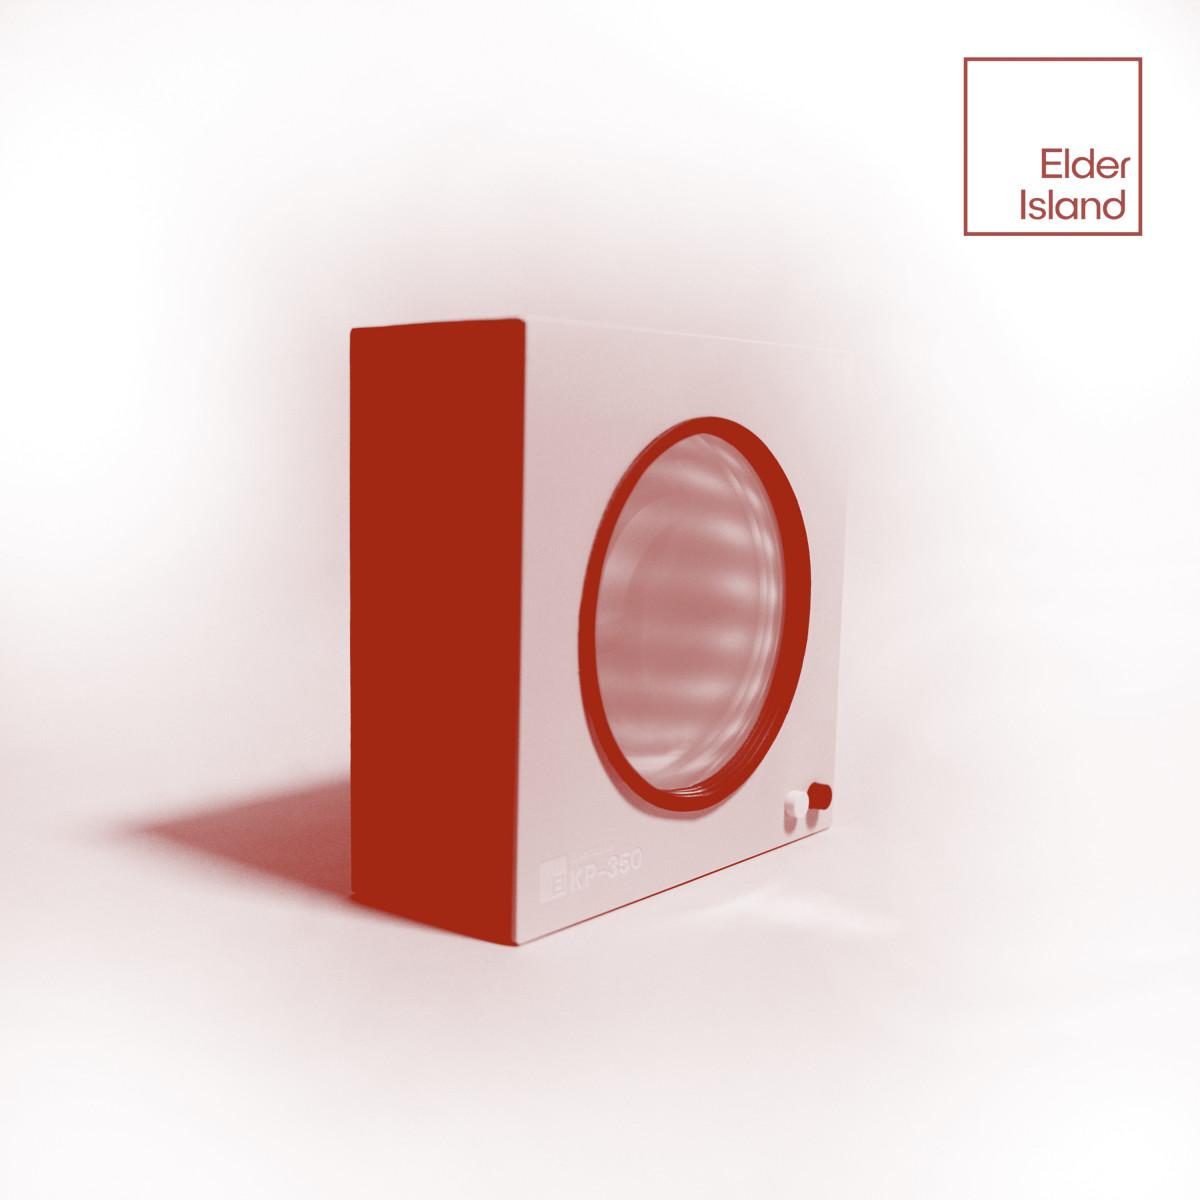 Ei - Kape Fear KP-350 - Remix Artwork